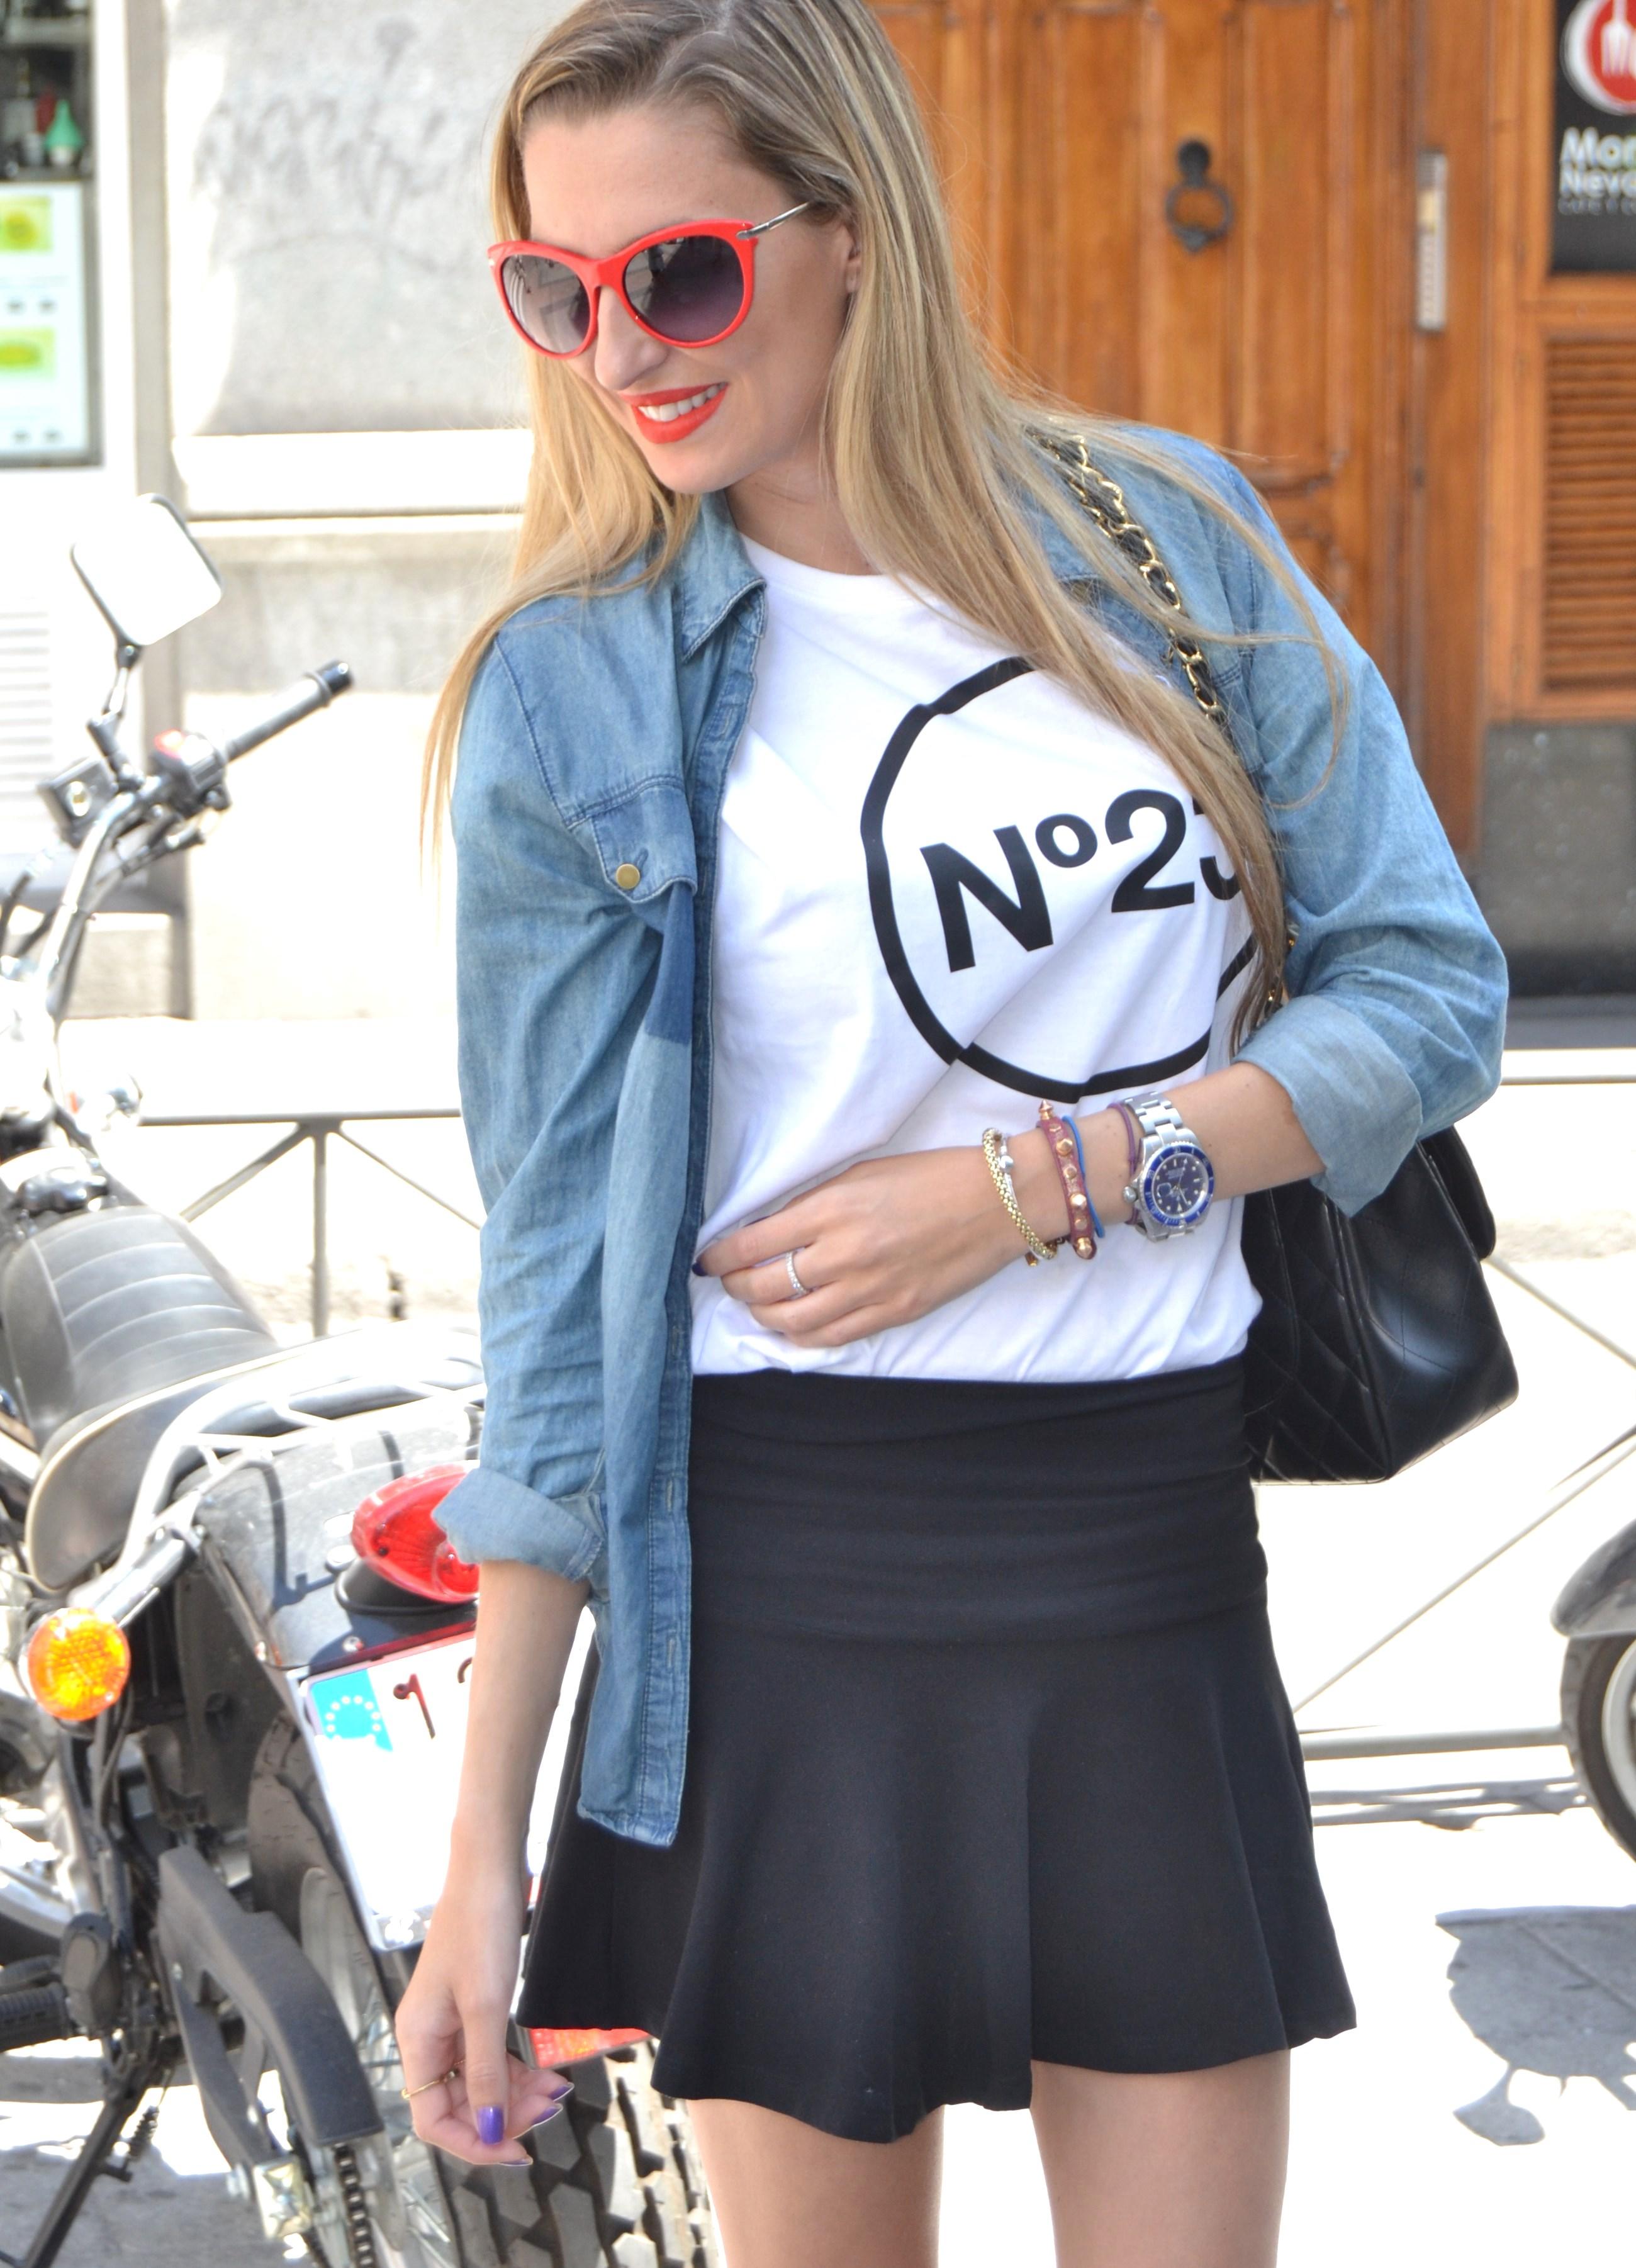 Nike_Free_FlyKnight_Sneakers_Chanel_255_Chanel_Bag_Guess_Sunglasses_Denim_Shirt_Lara_Martin_Gilarranz_Bymyheels (8)